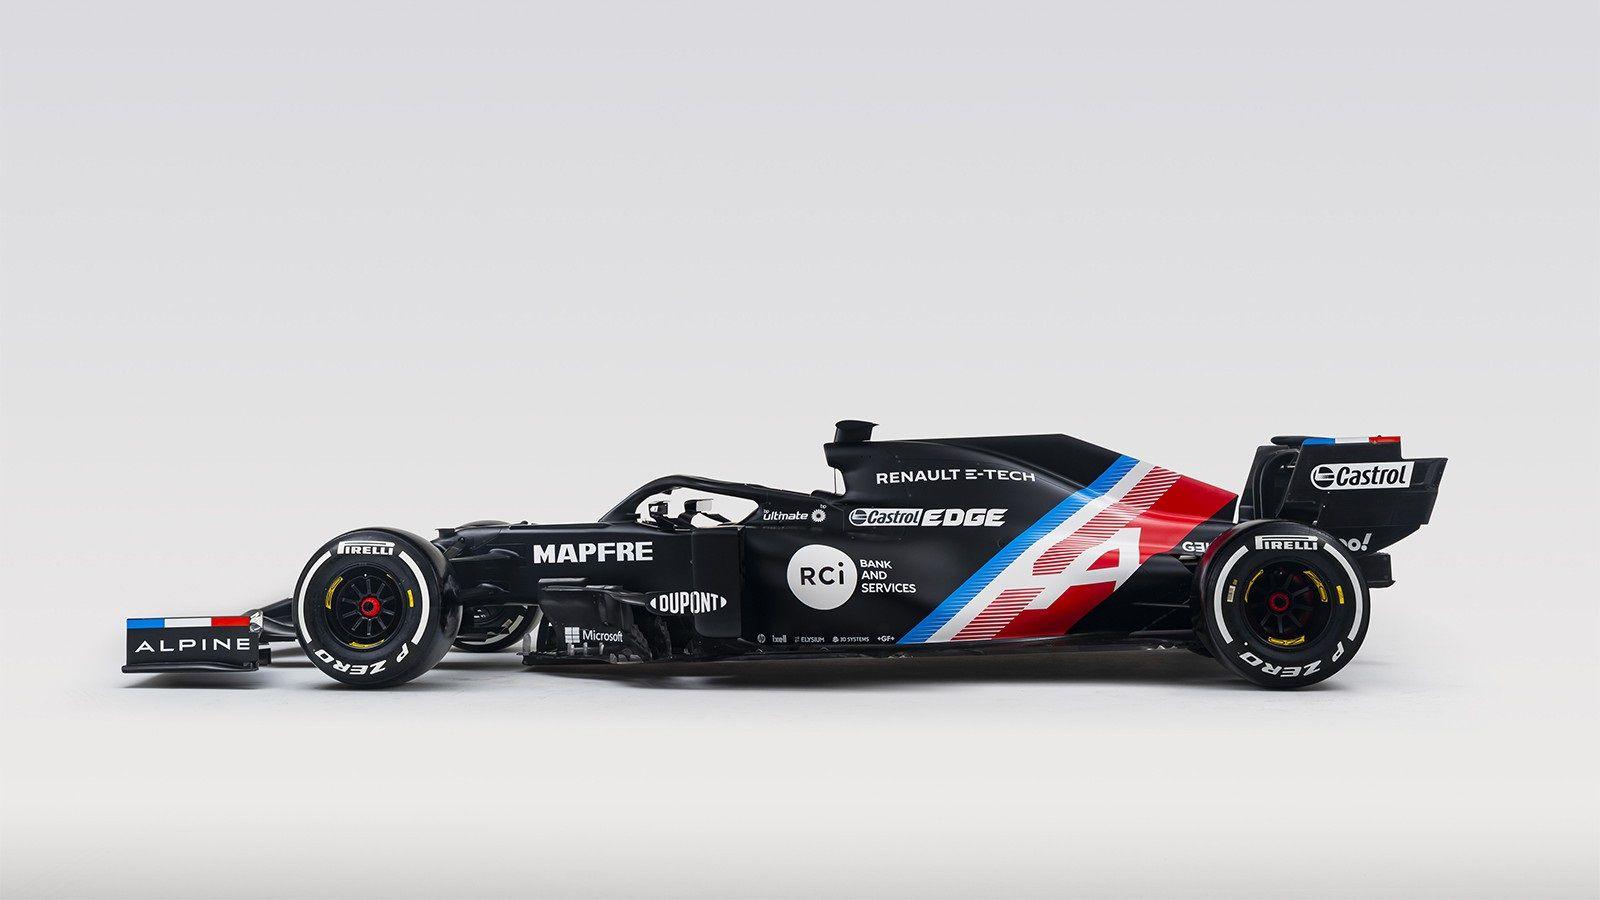 14/01/2021 Coche Alpine que pilotará Fernando Alonso MOTOR DEPORTES DEPORTES DEPORTES F1 MOTOR MUNDIAL DEPORTES ALPINE